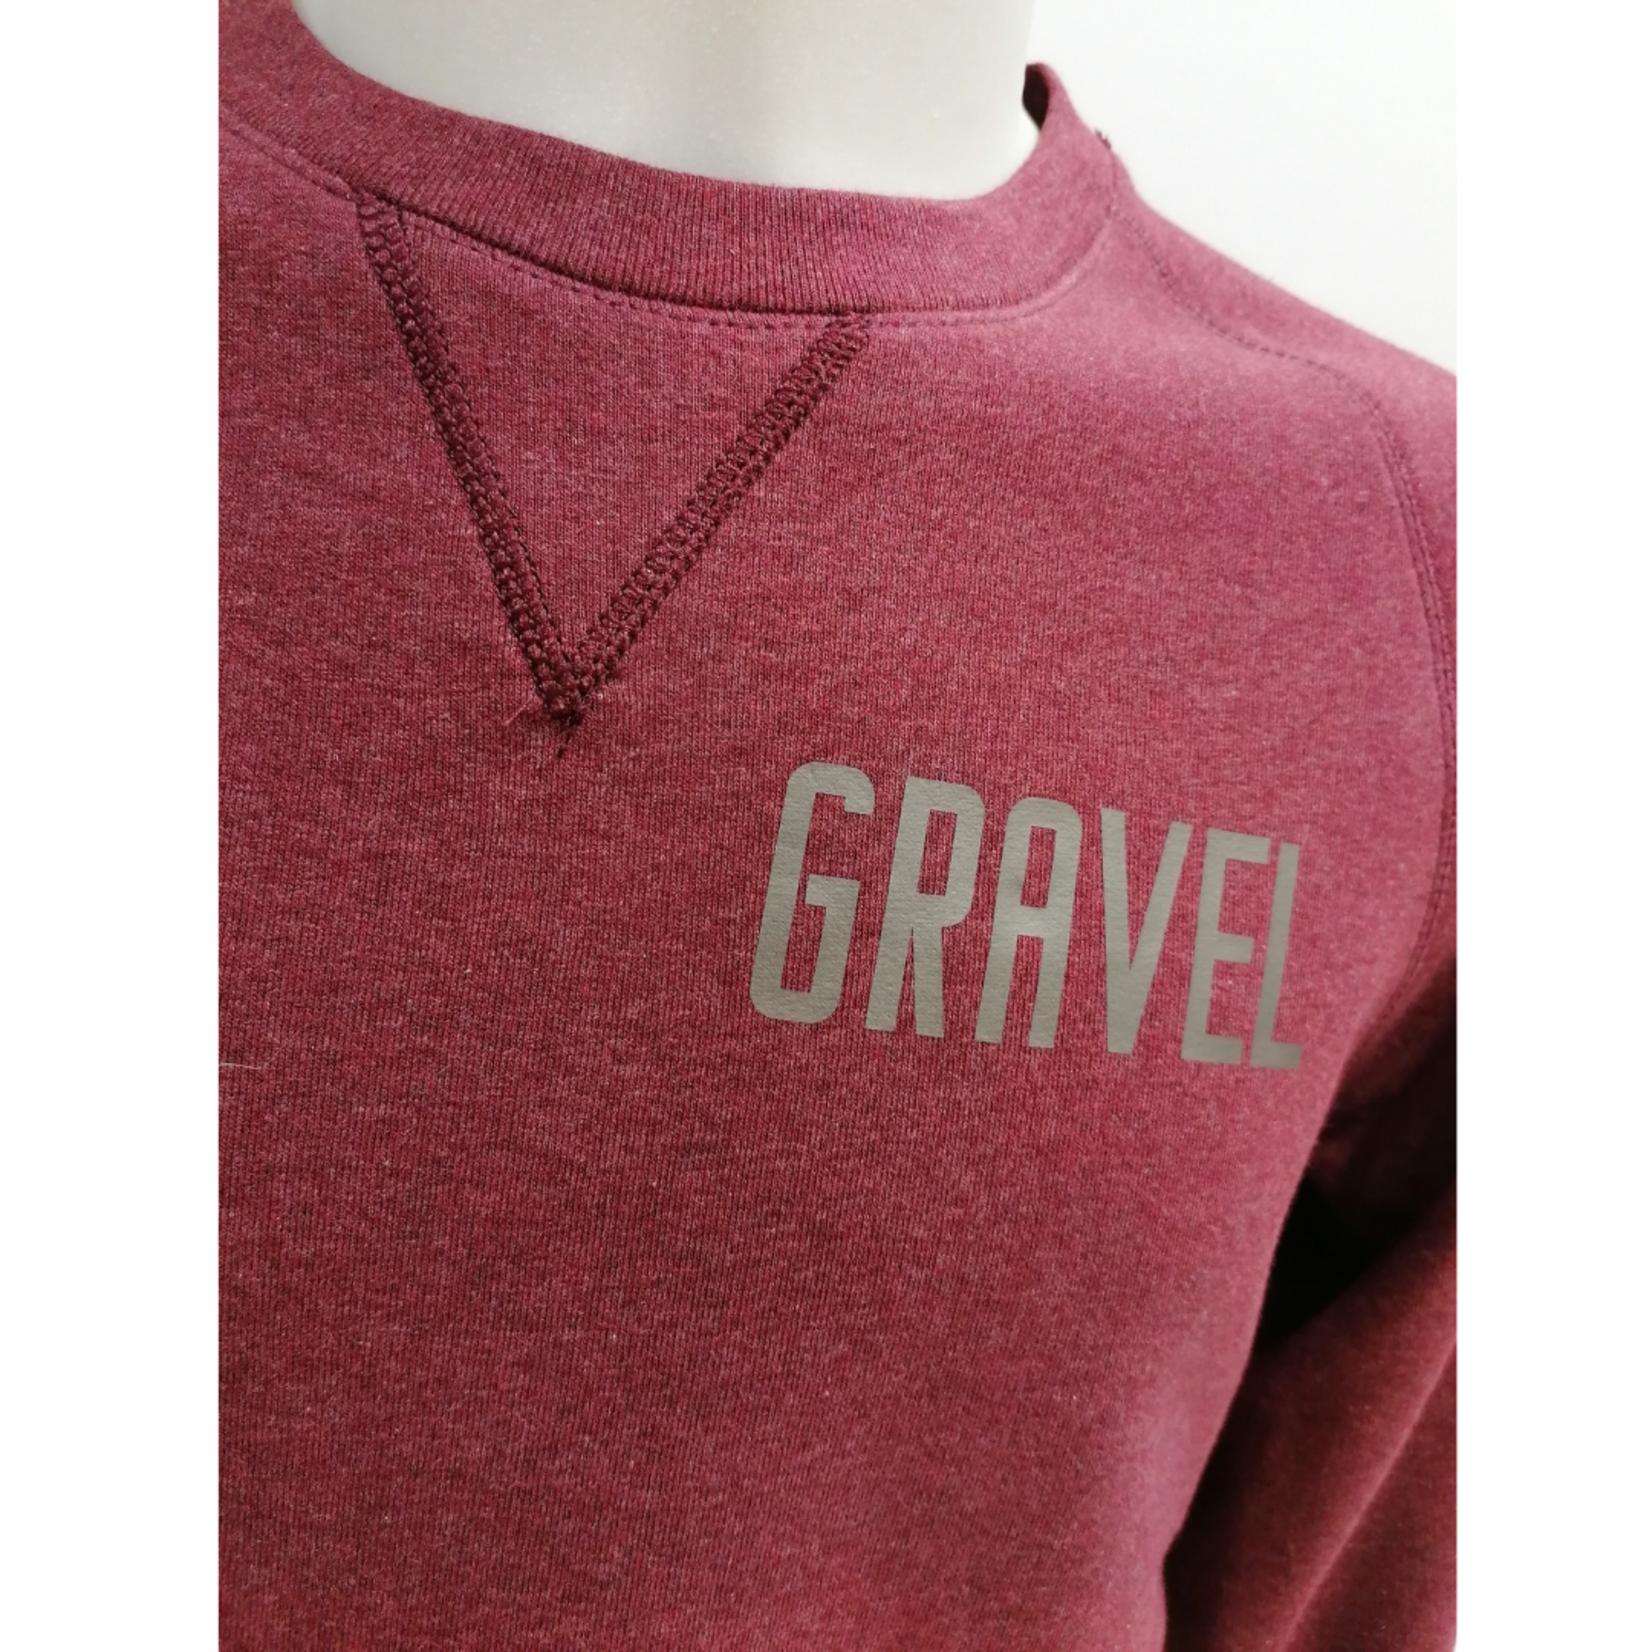 Verloy Heren - Organic Cotton Crew Sweater